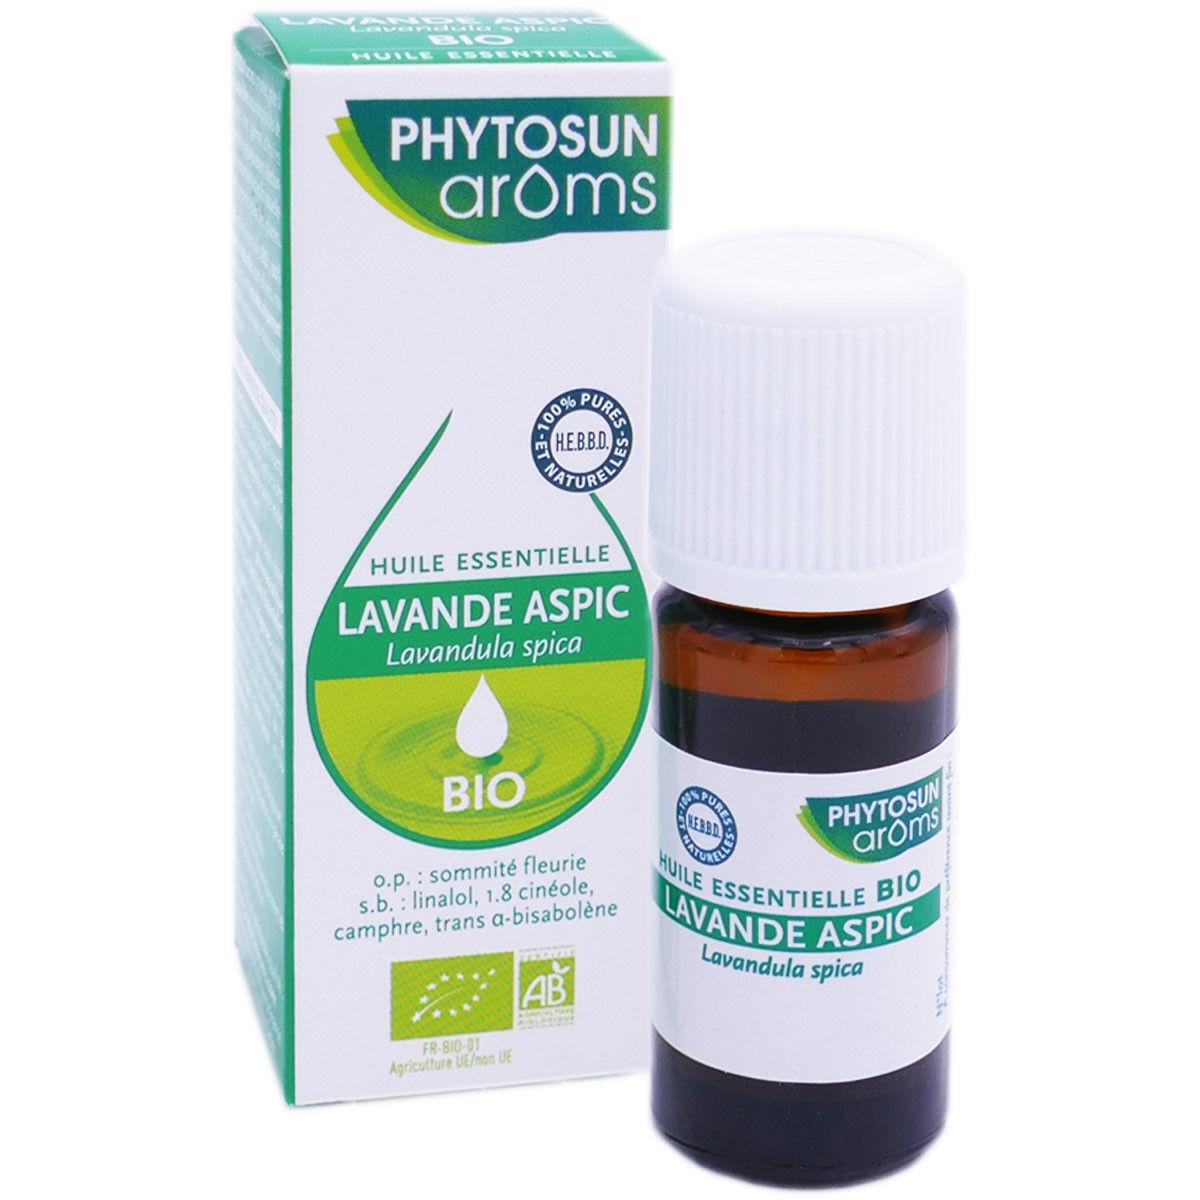 Phytosun aroms huile essentielle lavande aspic bio 10 ml